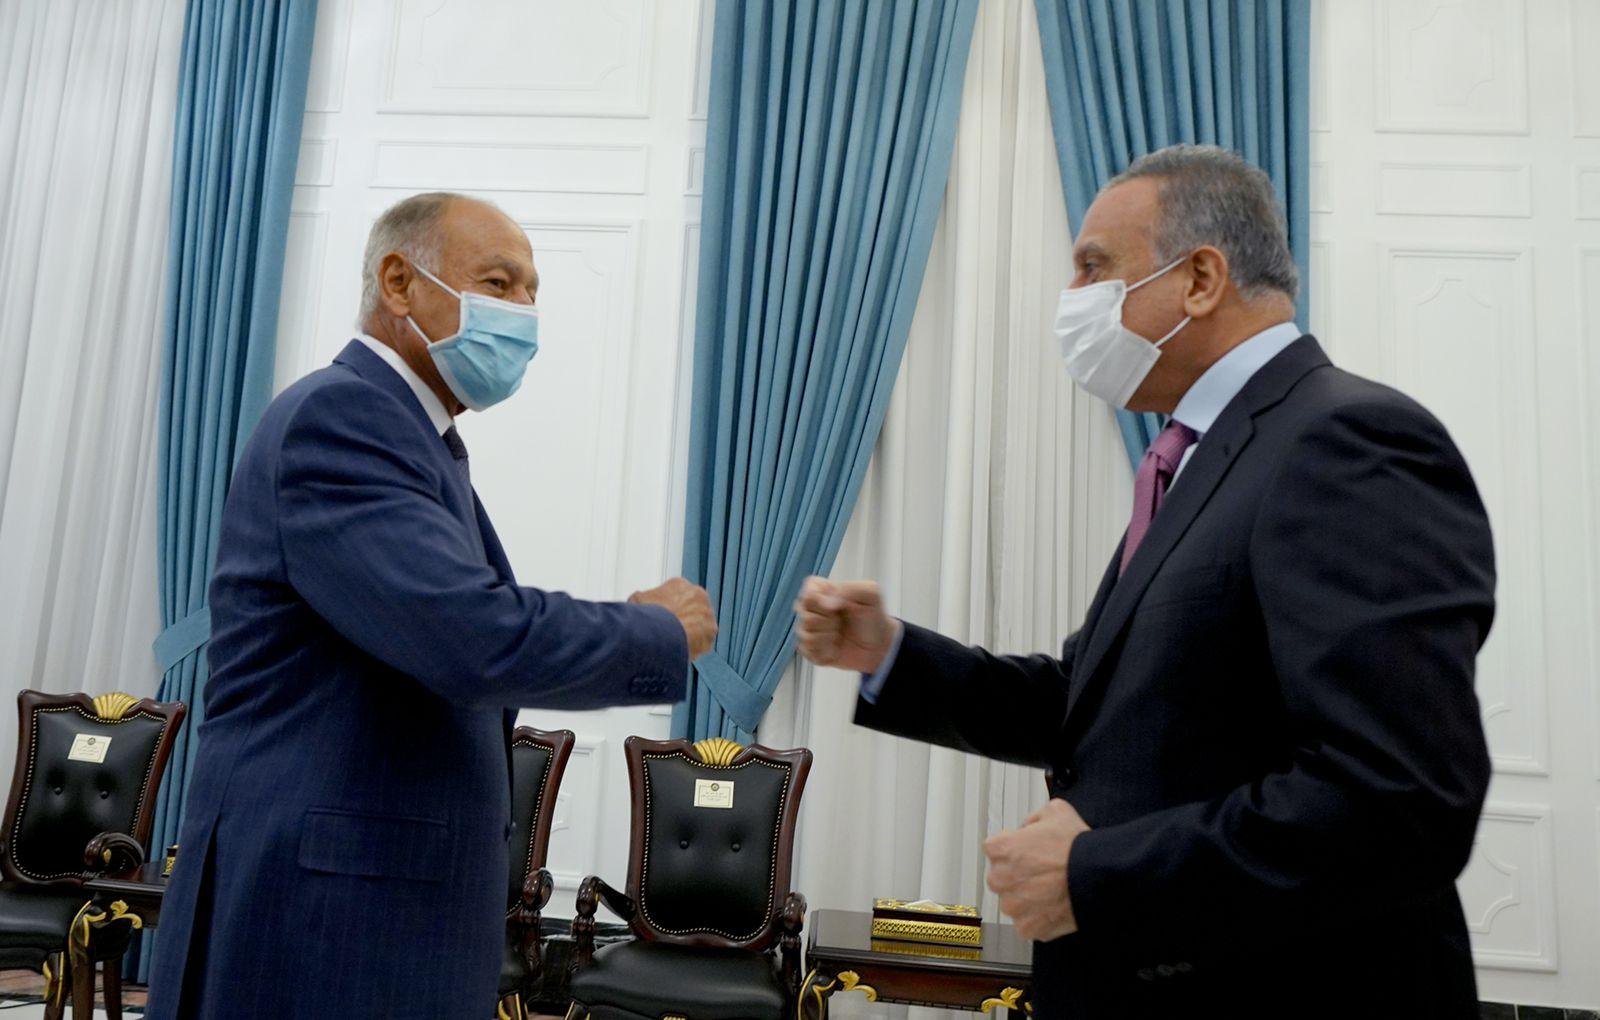 PM al-Kadhimi: Iraq prioritizes dialogue